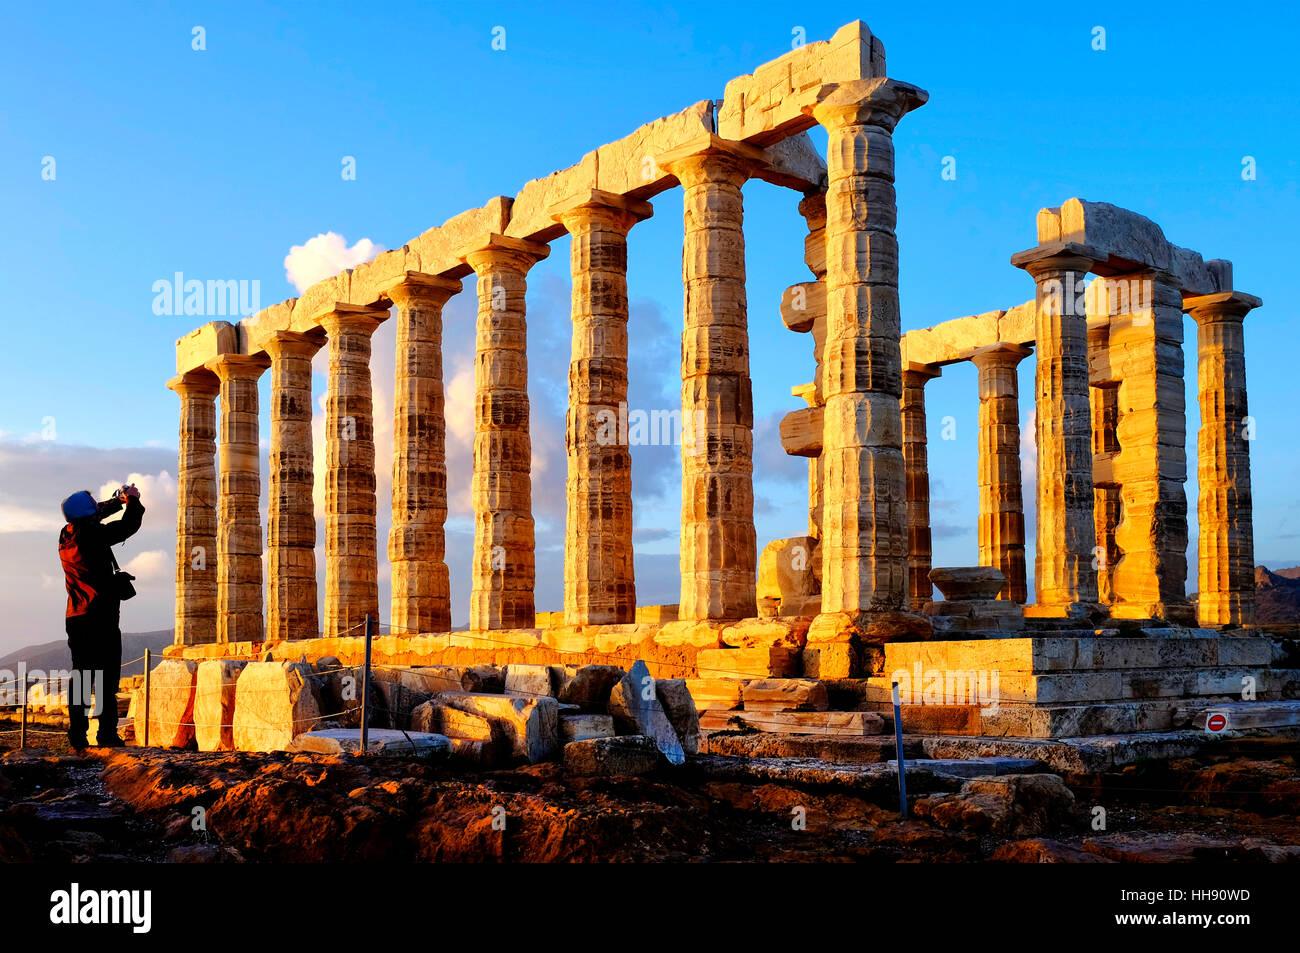 Ruins of temple of Poseidon at Cape Sounion, Attica Peninsula, Greece - Stock Image